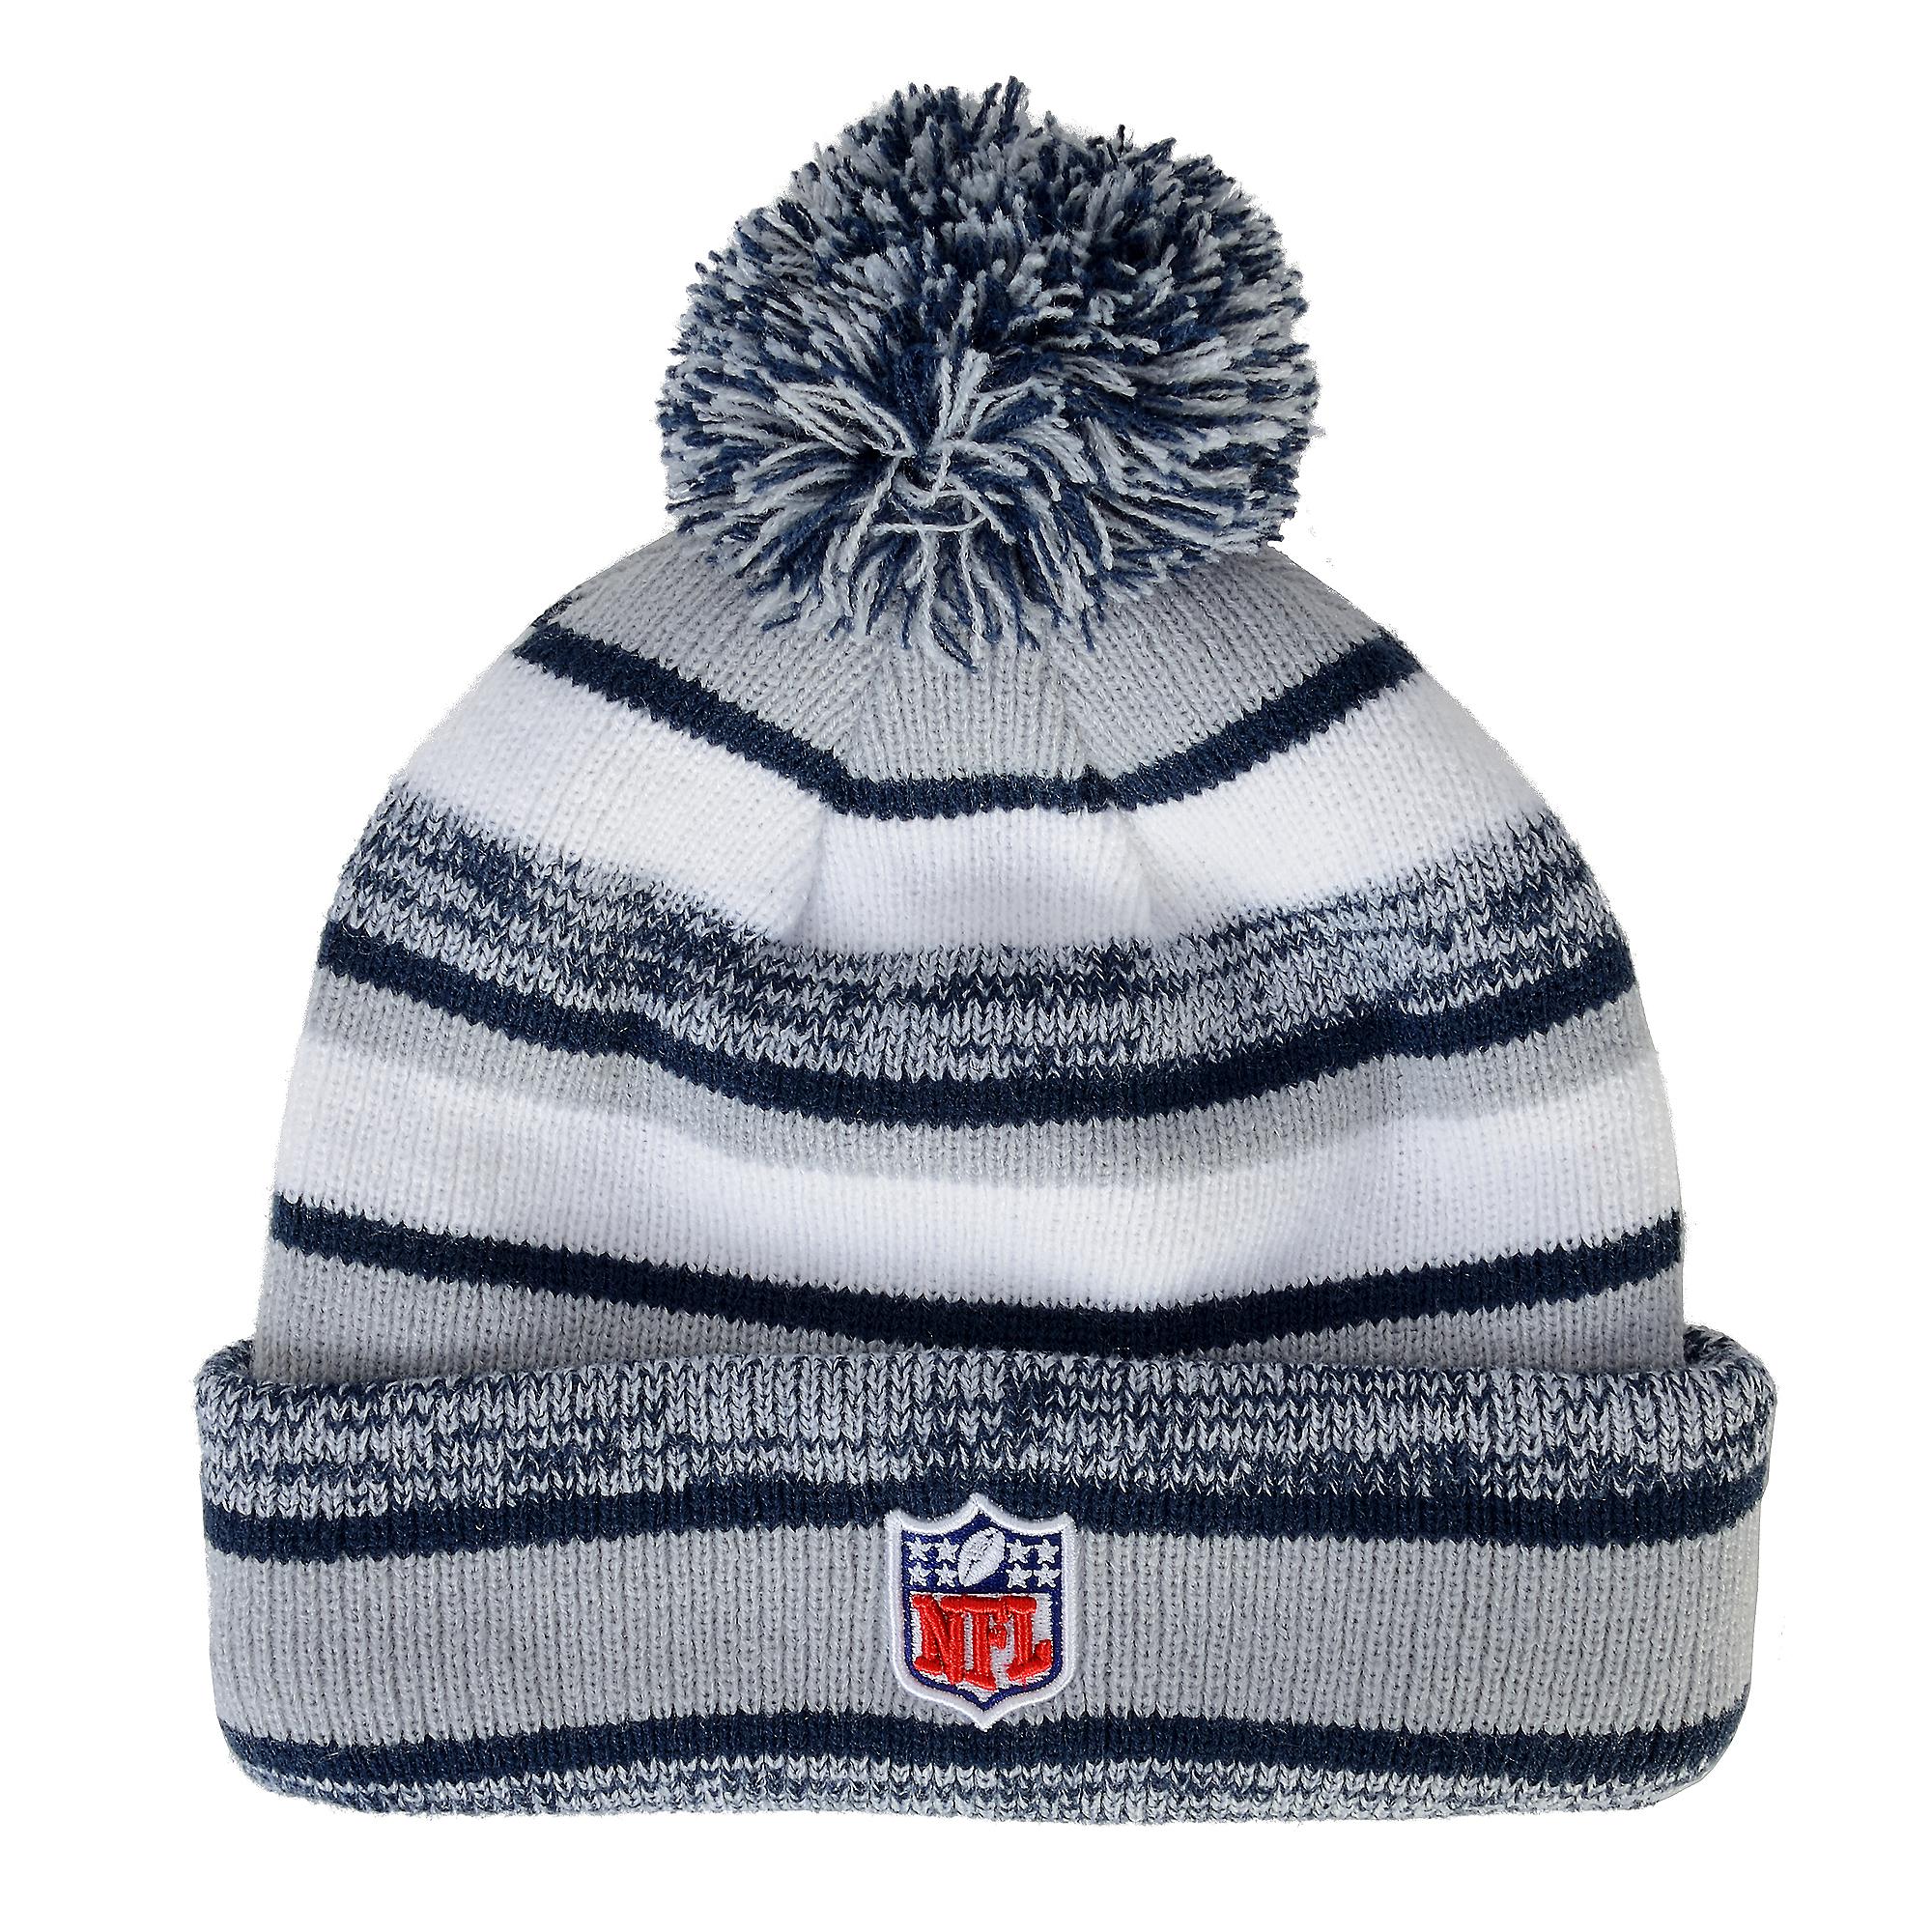 ... Dallas Cowboys New Era Sideline Sport Knit Cap ... ac32419d9